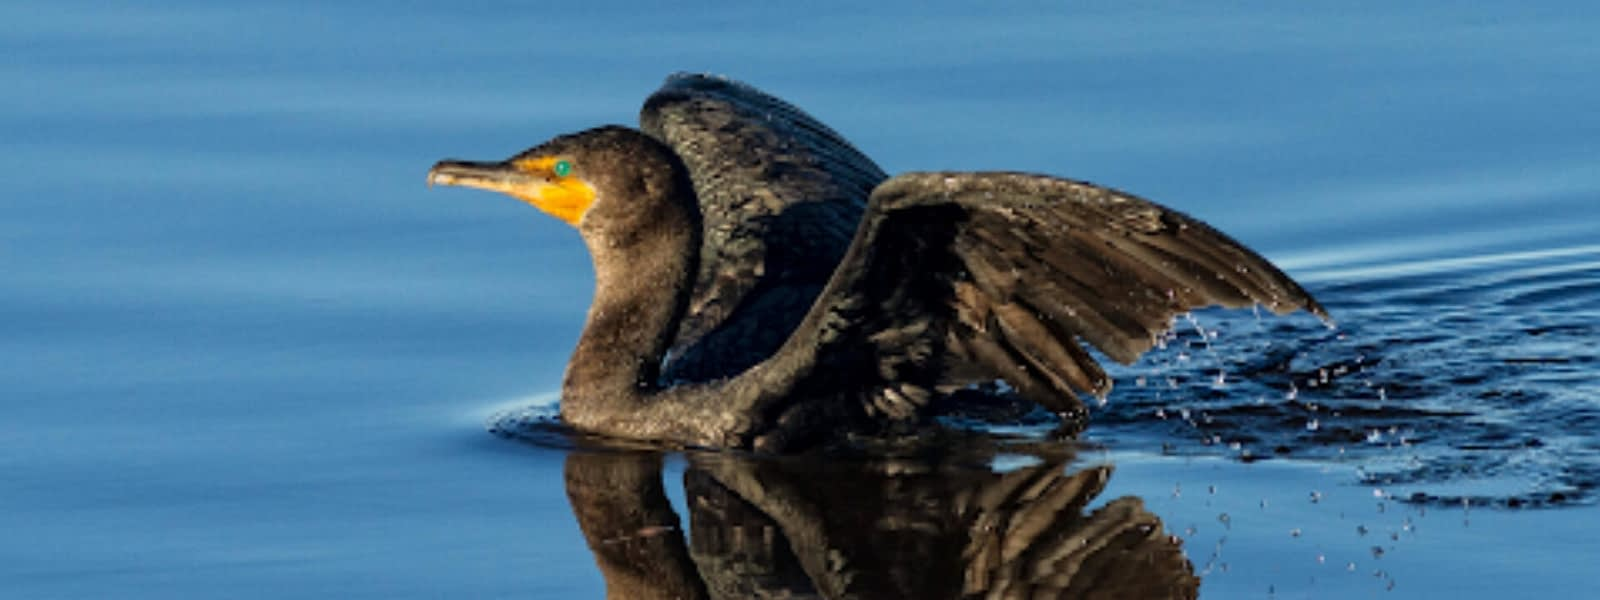 Sharon Milligan/Audubon Photography Awards